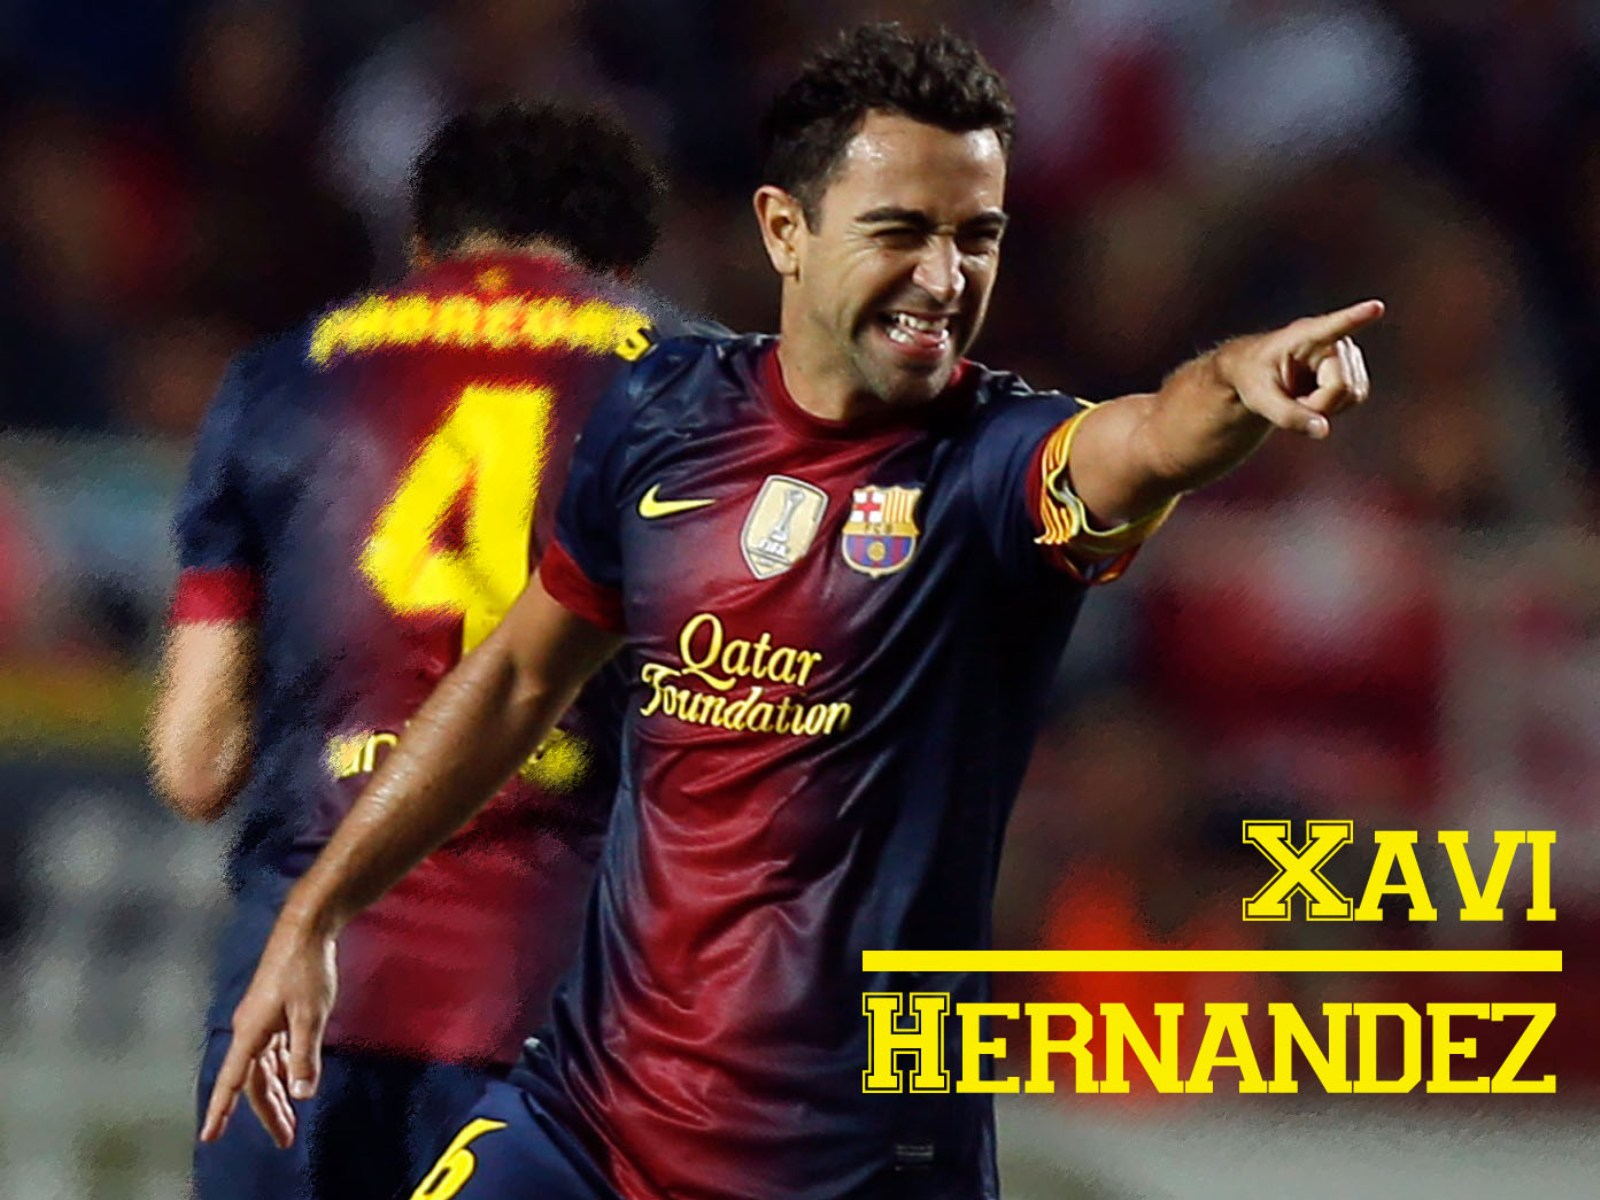 Football Xavi Hernandez hd Wallpapers 2013 1600x1200